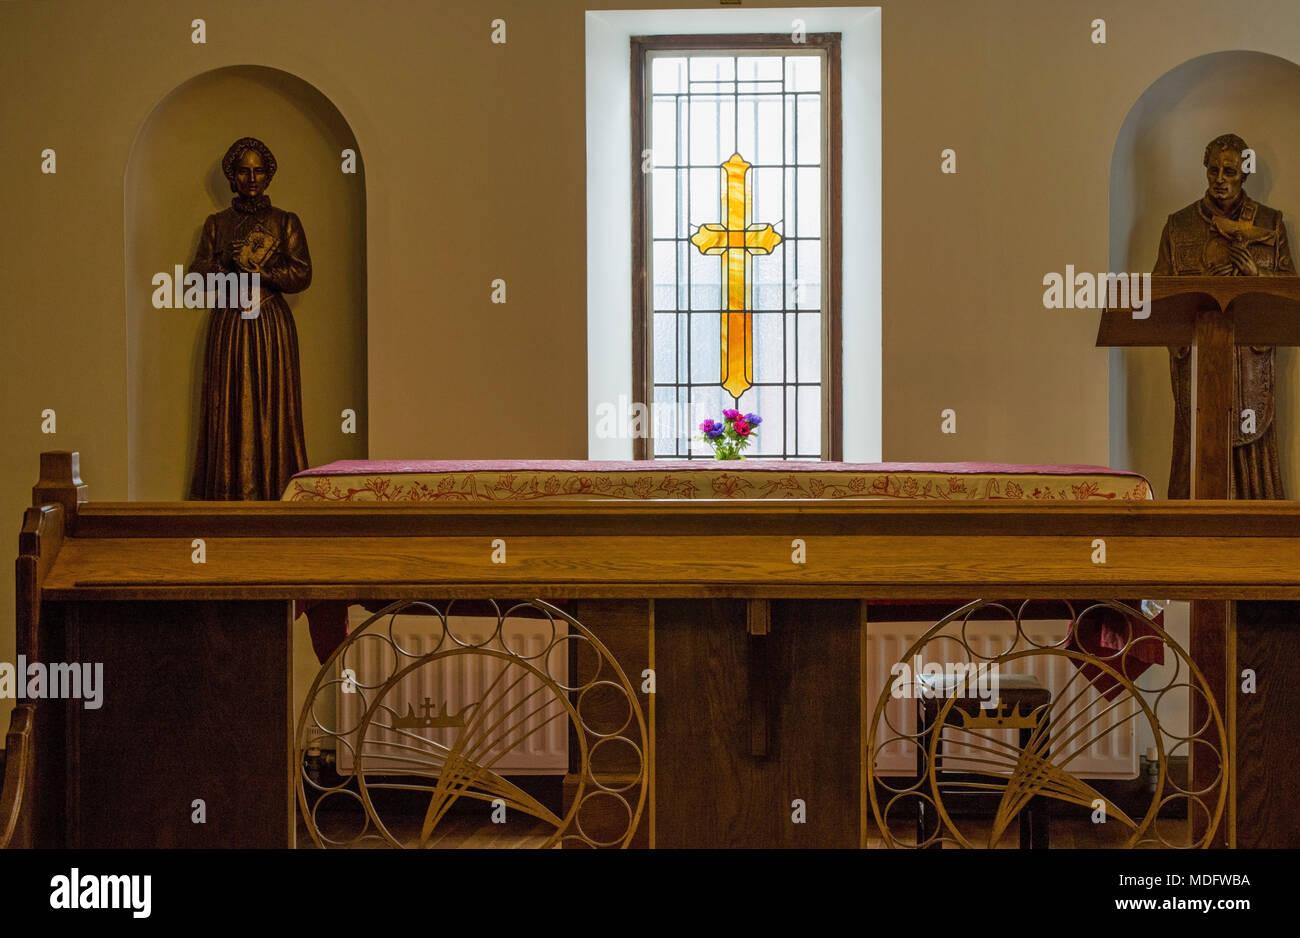 The Shrine of The Saint Margaret Clitherow,York,North Yorkshire,England,UK. - Stock Image